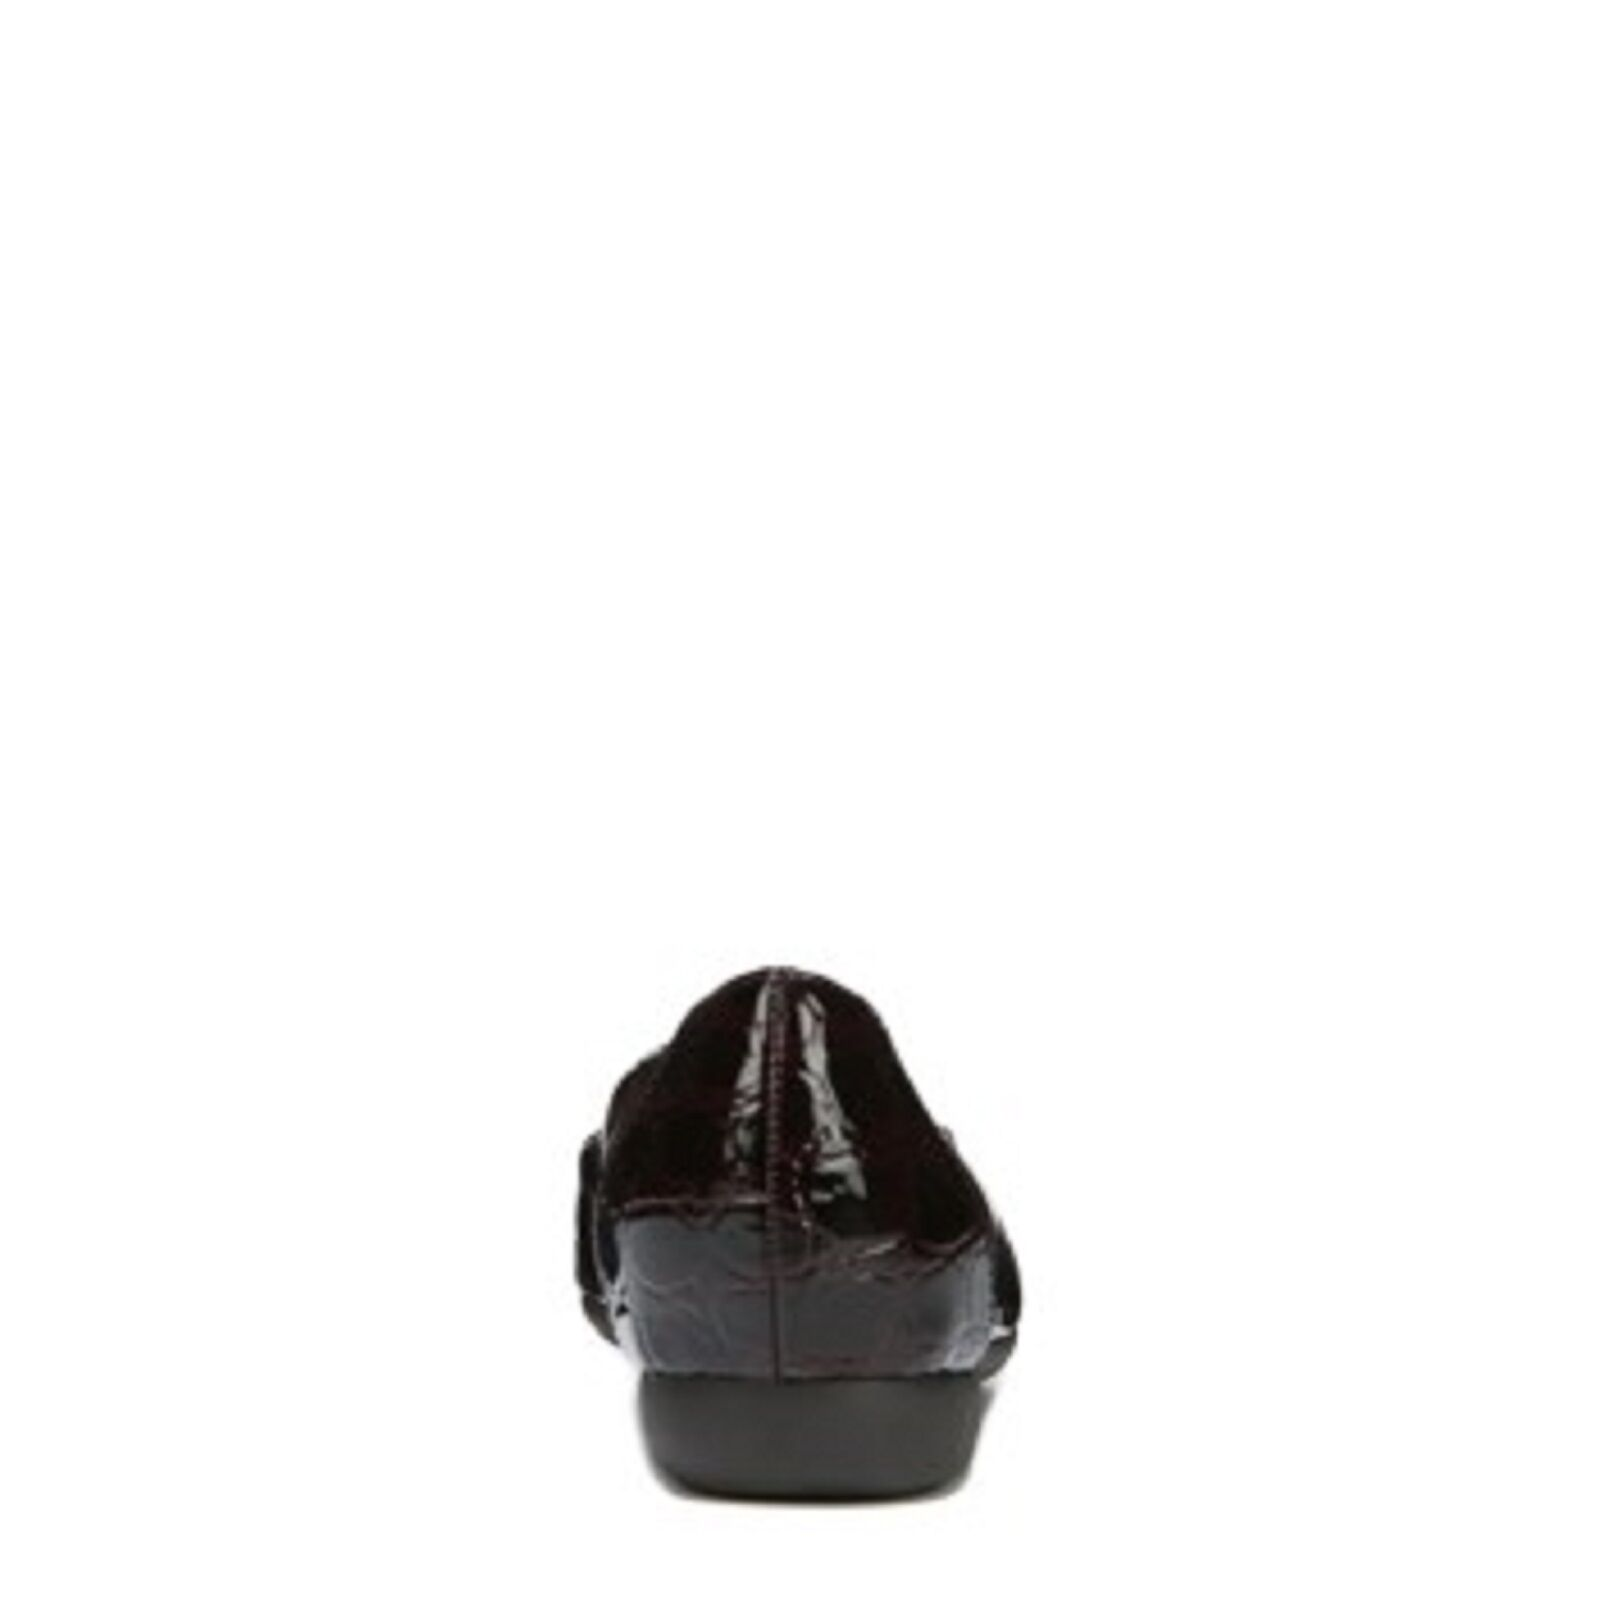 NATURALIZER CALE CALE CALE Ladies Brown Square Toe Croc Print Texture Loafer Sz. 10 M NIB 06a8db